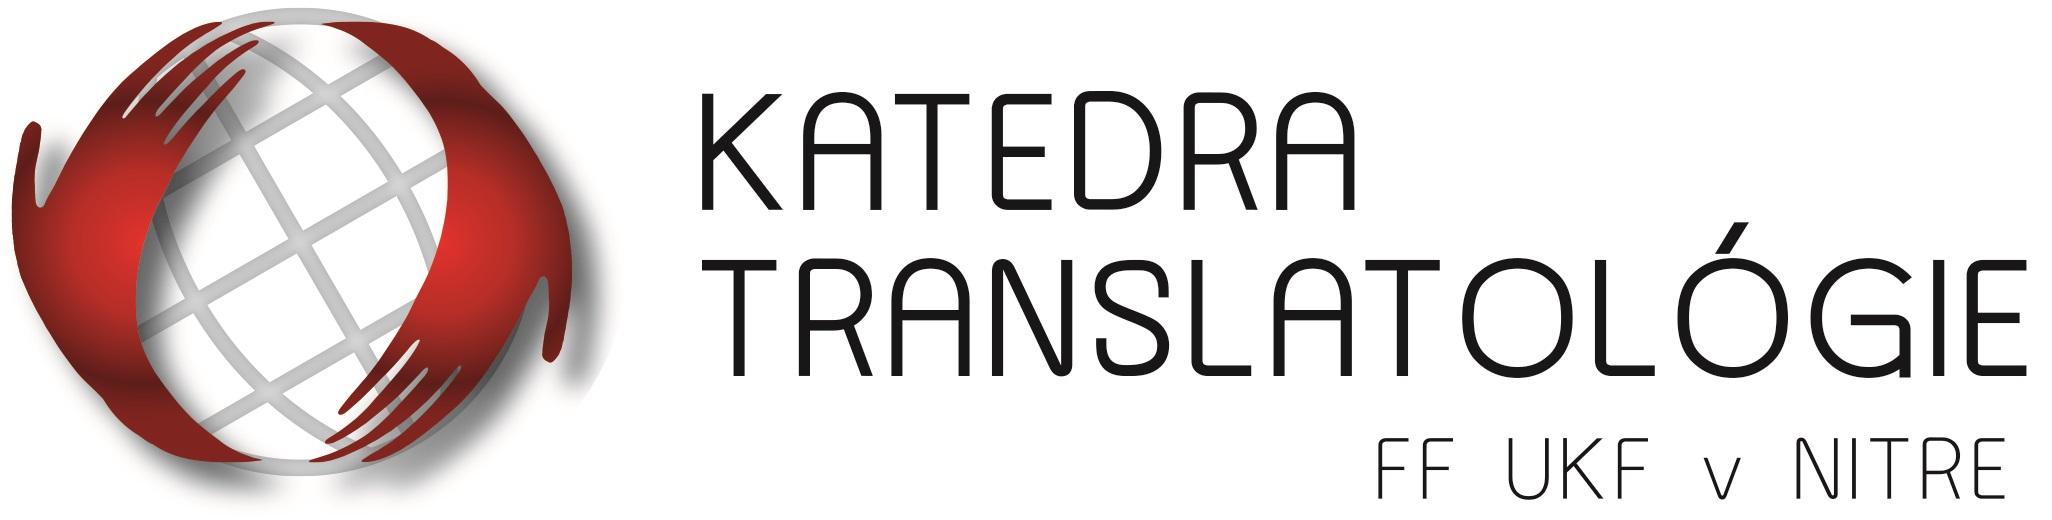 Katedra translatológie FF UKF v Nitre